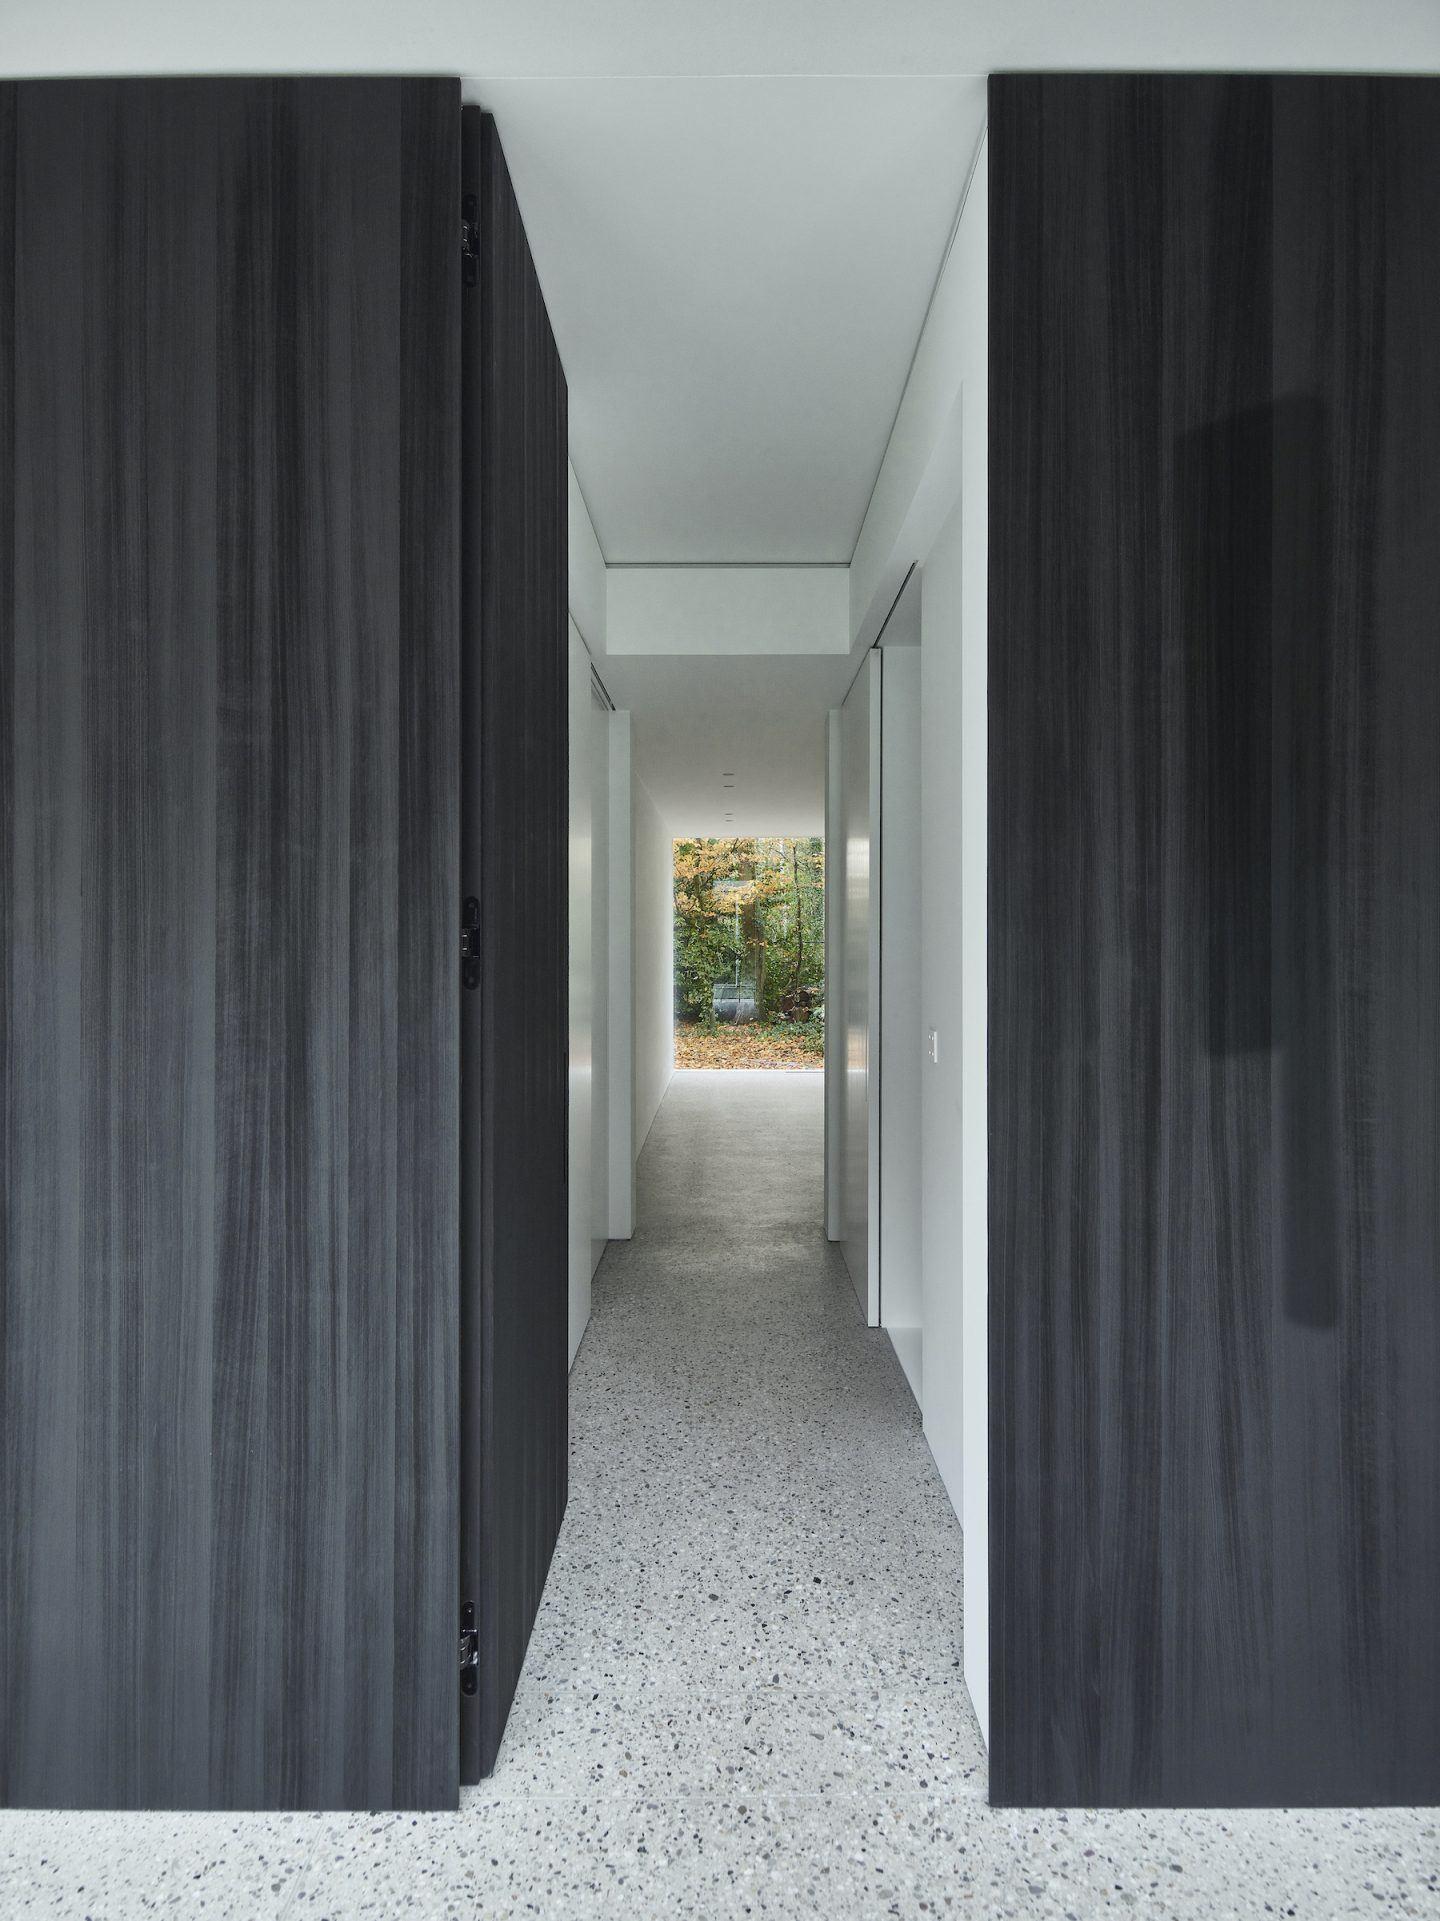 IGNANT-Architecture-DDM-Architecture-House-Bras-11